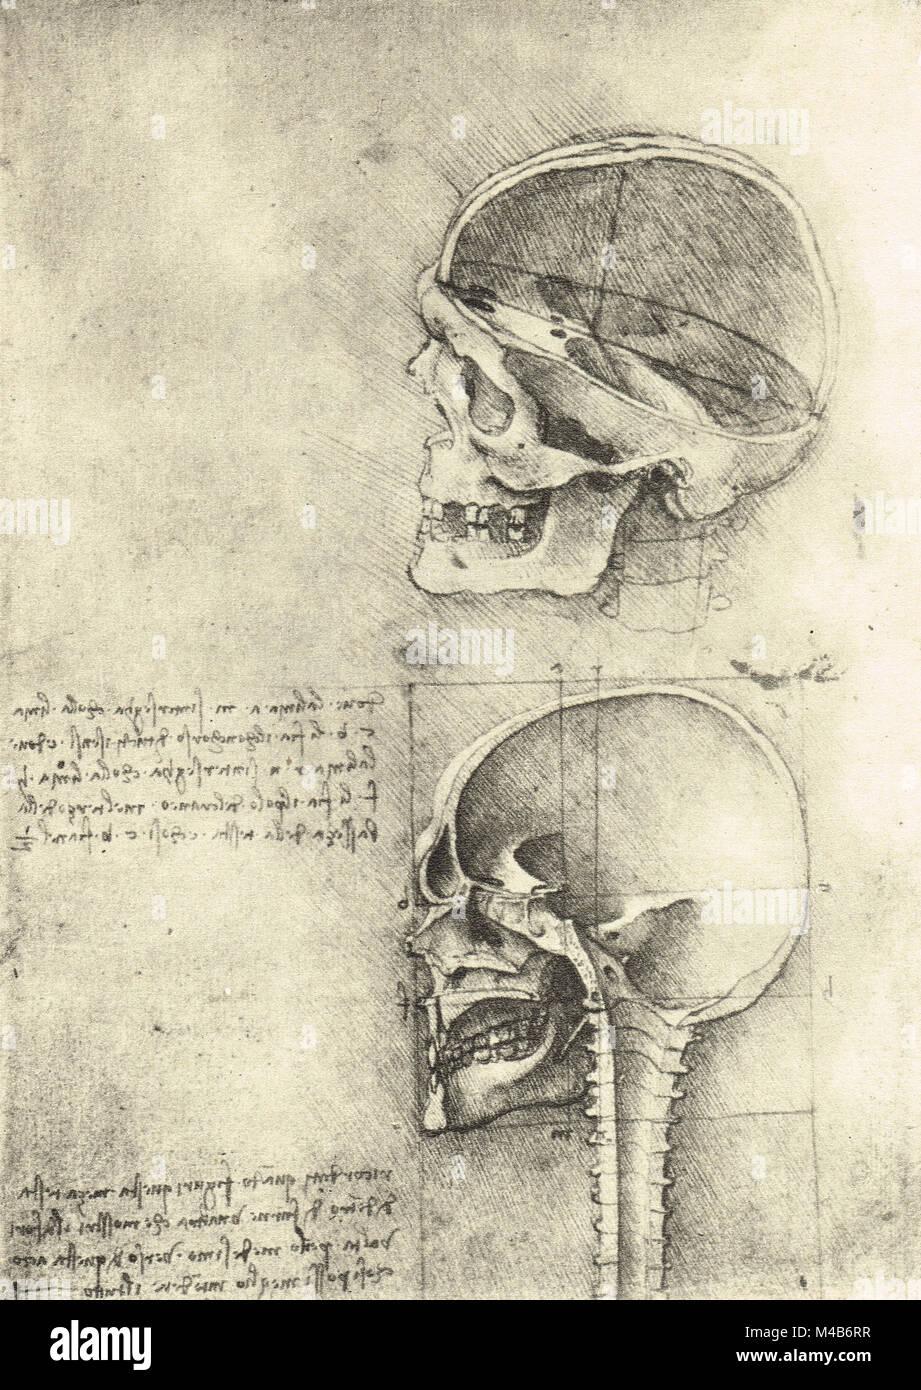 Study Anatomy Leonardo Da Vinci Stock Photos & Study Anatomy ...